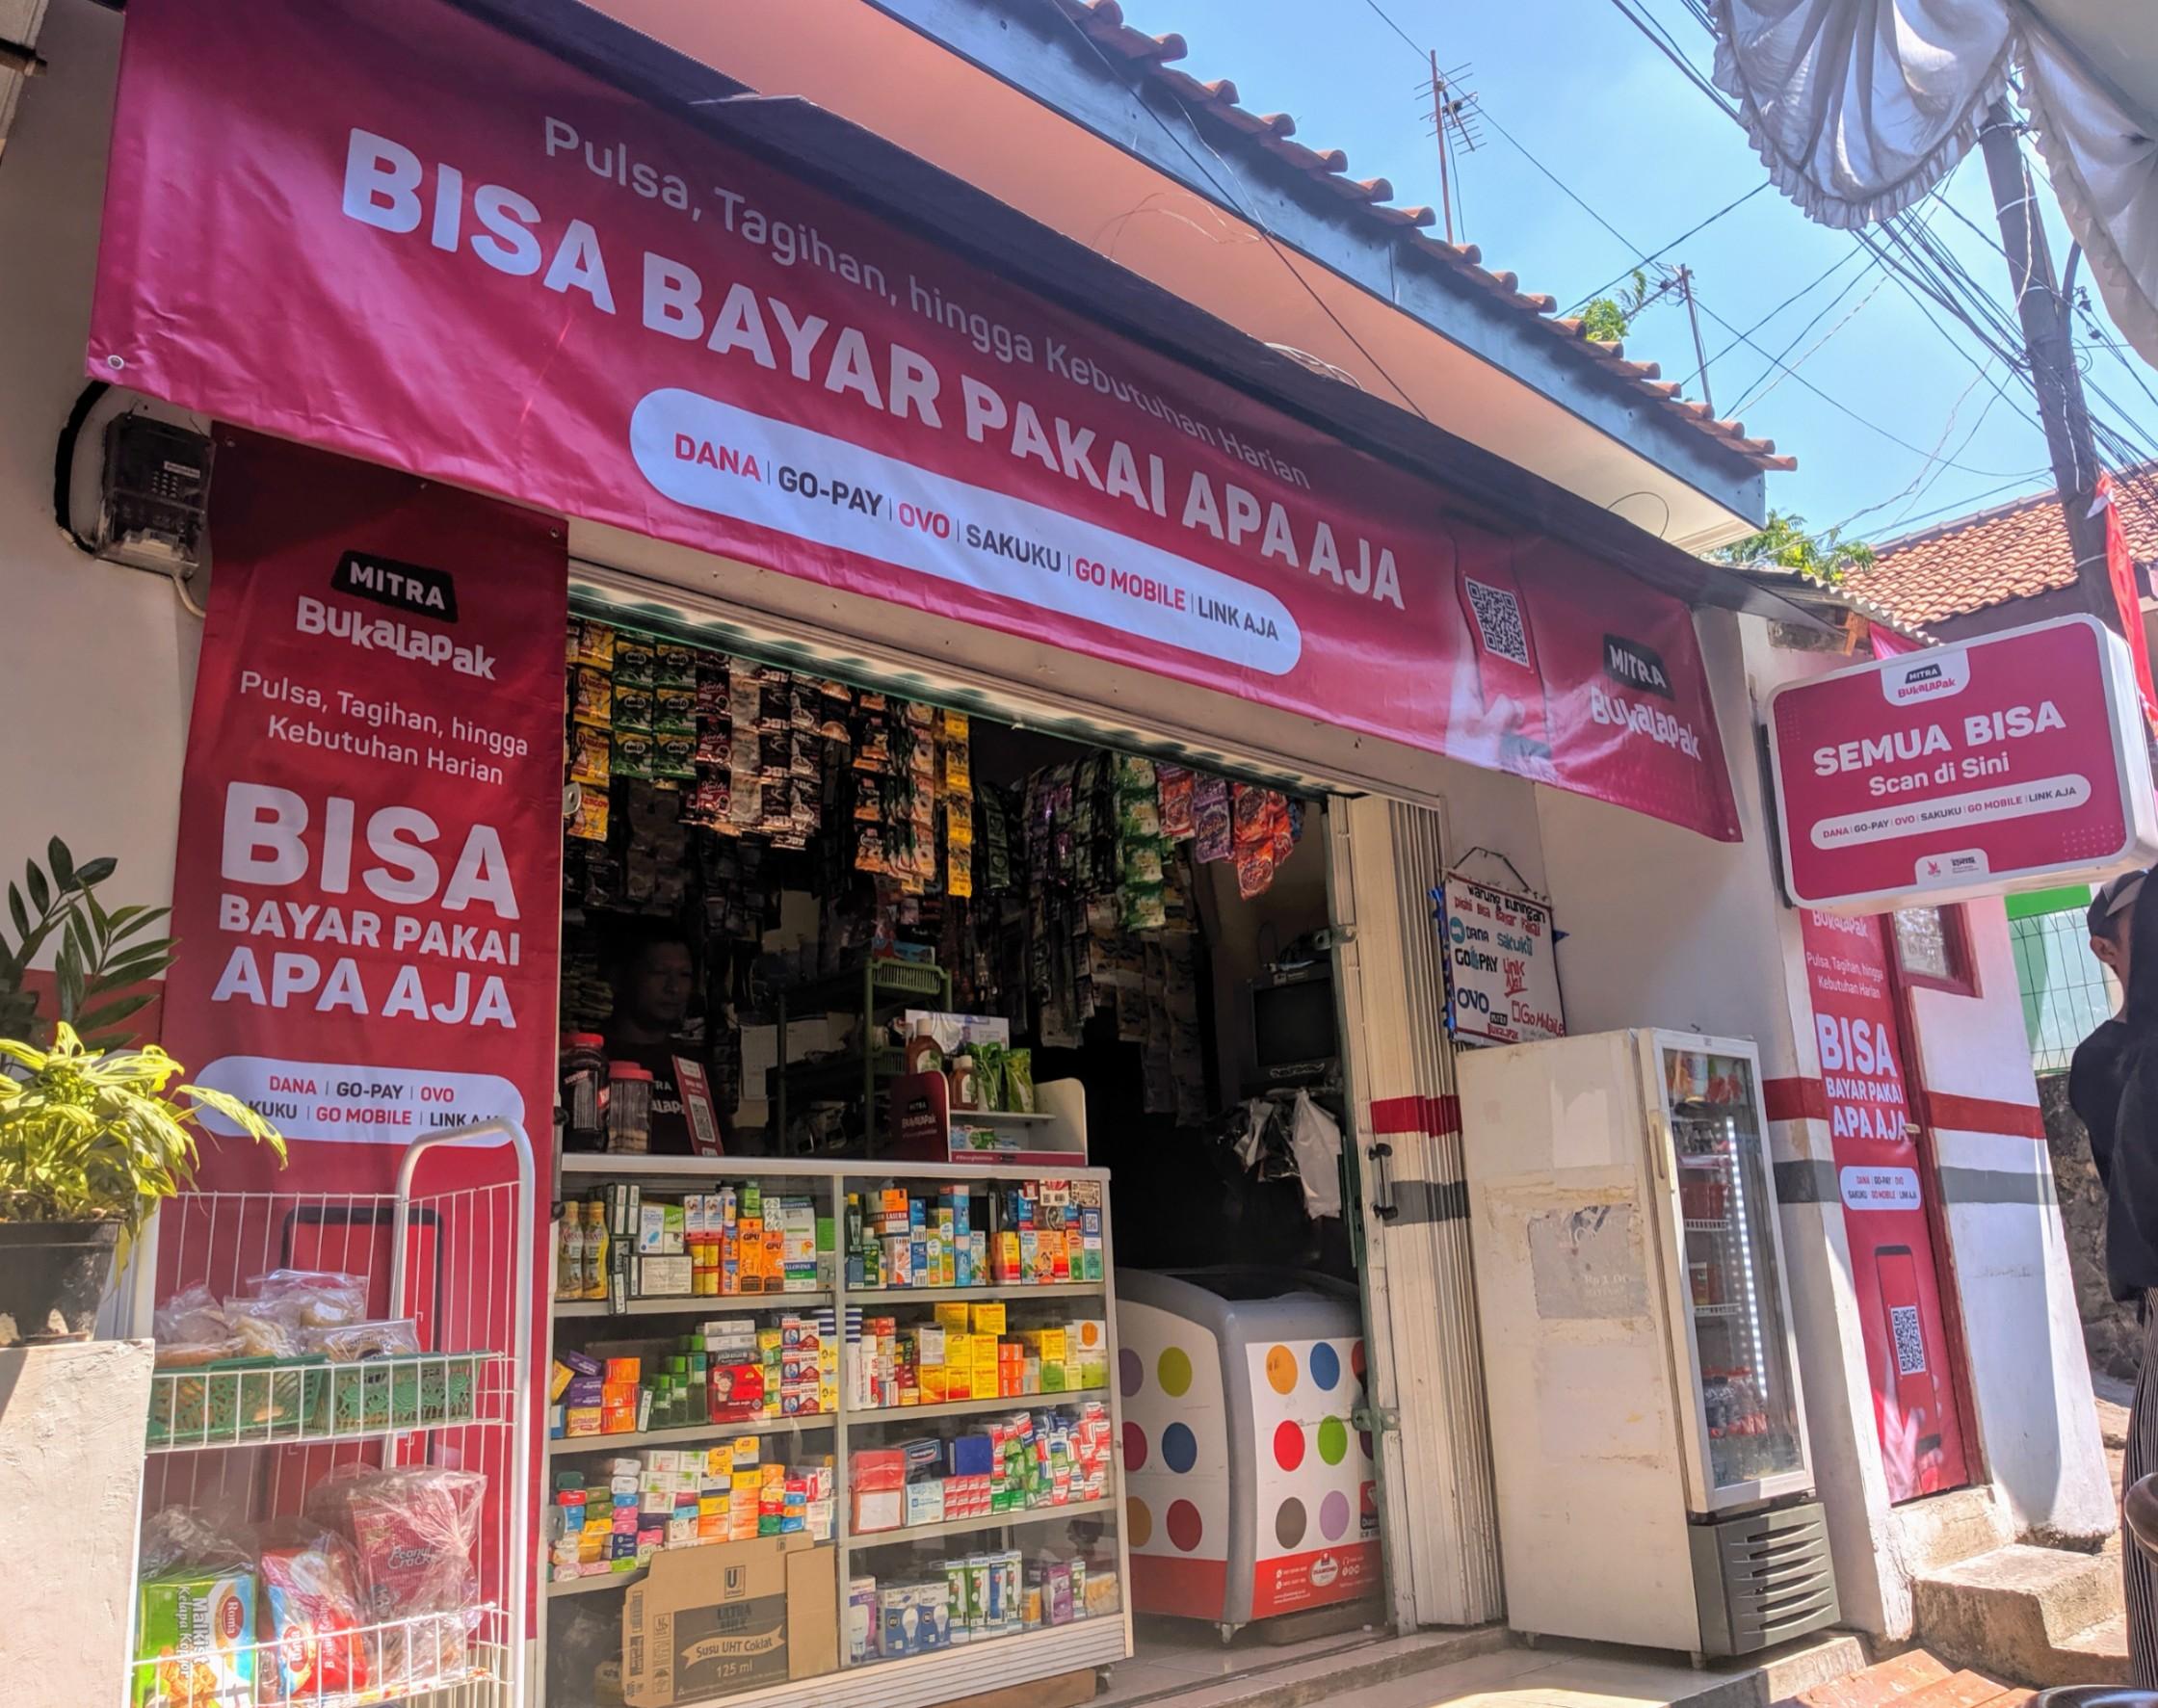 Warung kelontong Mitra Bukalapak yang telah bergabung dengan QRIS / DailySocial